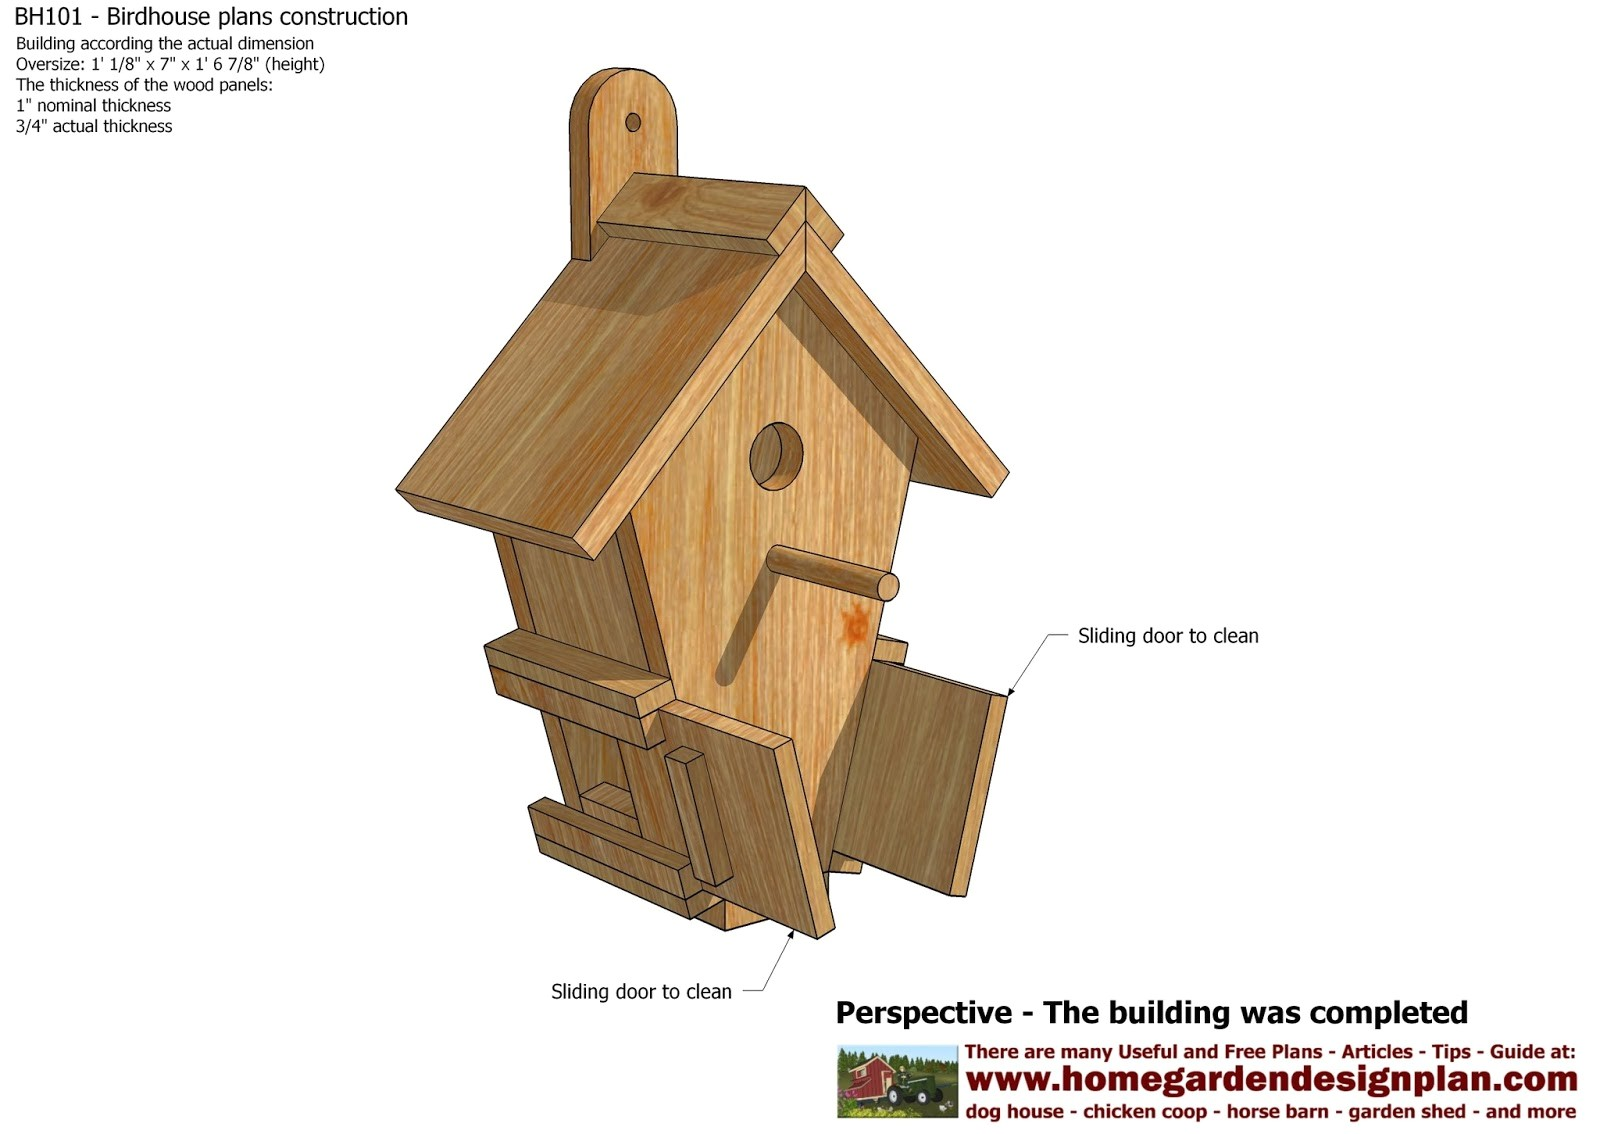 bh101 bird house plans construction